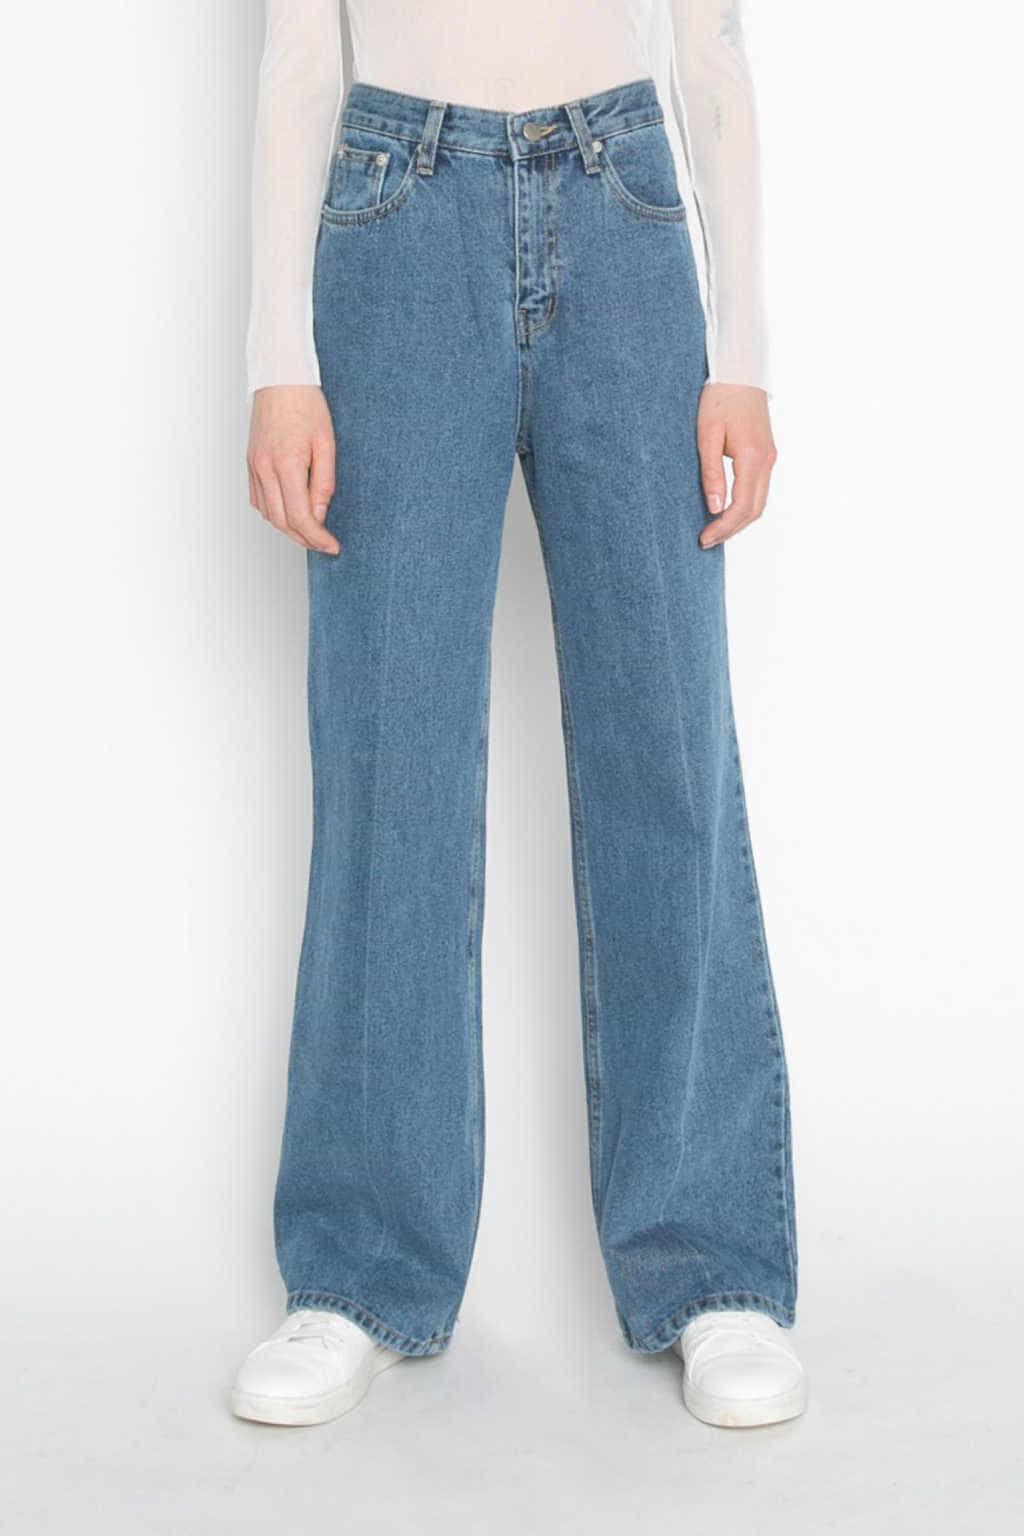 Vintage Jean H008 Indigo 2